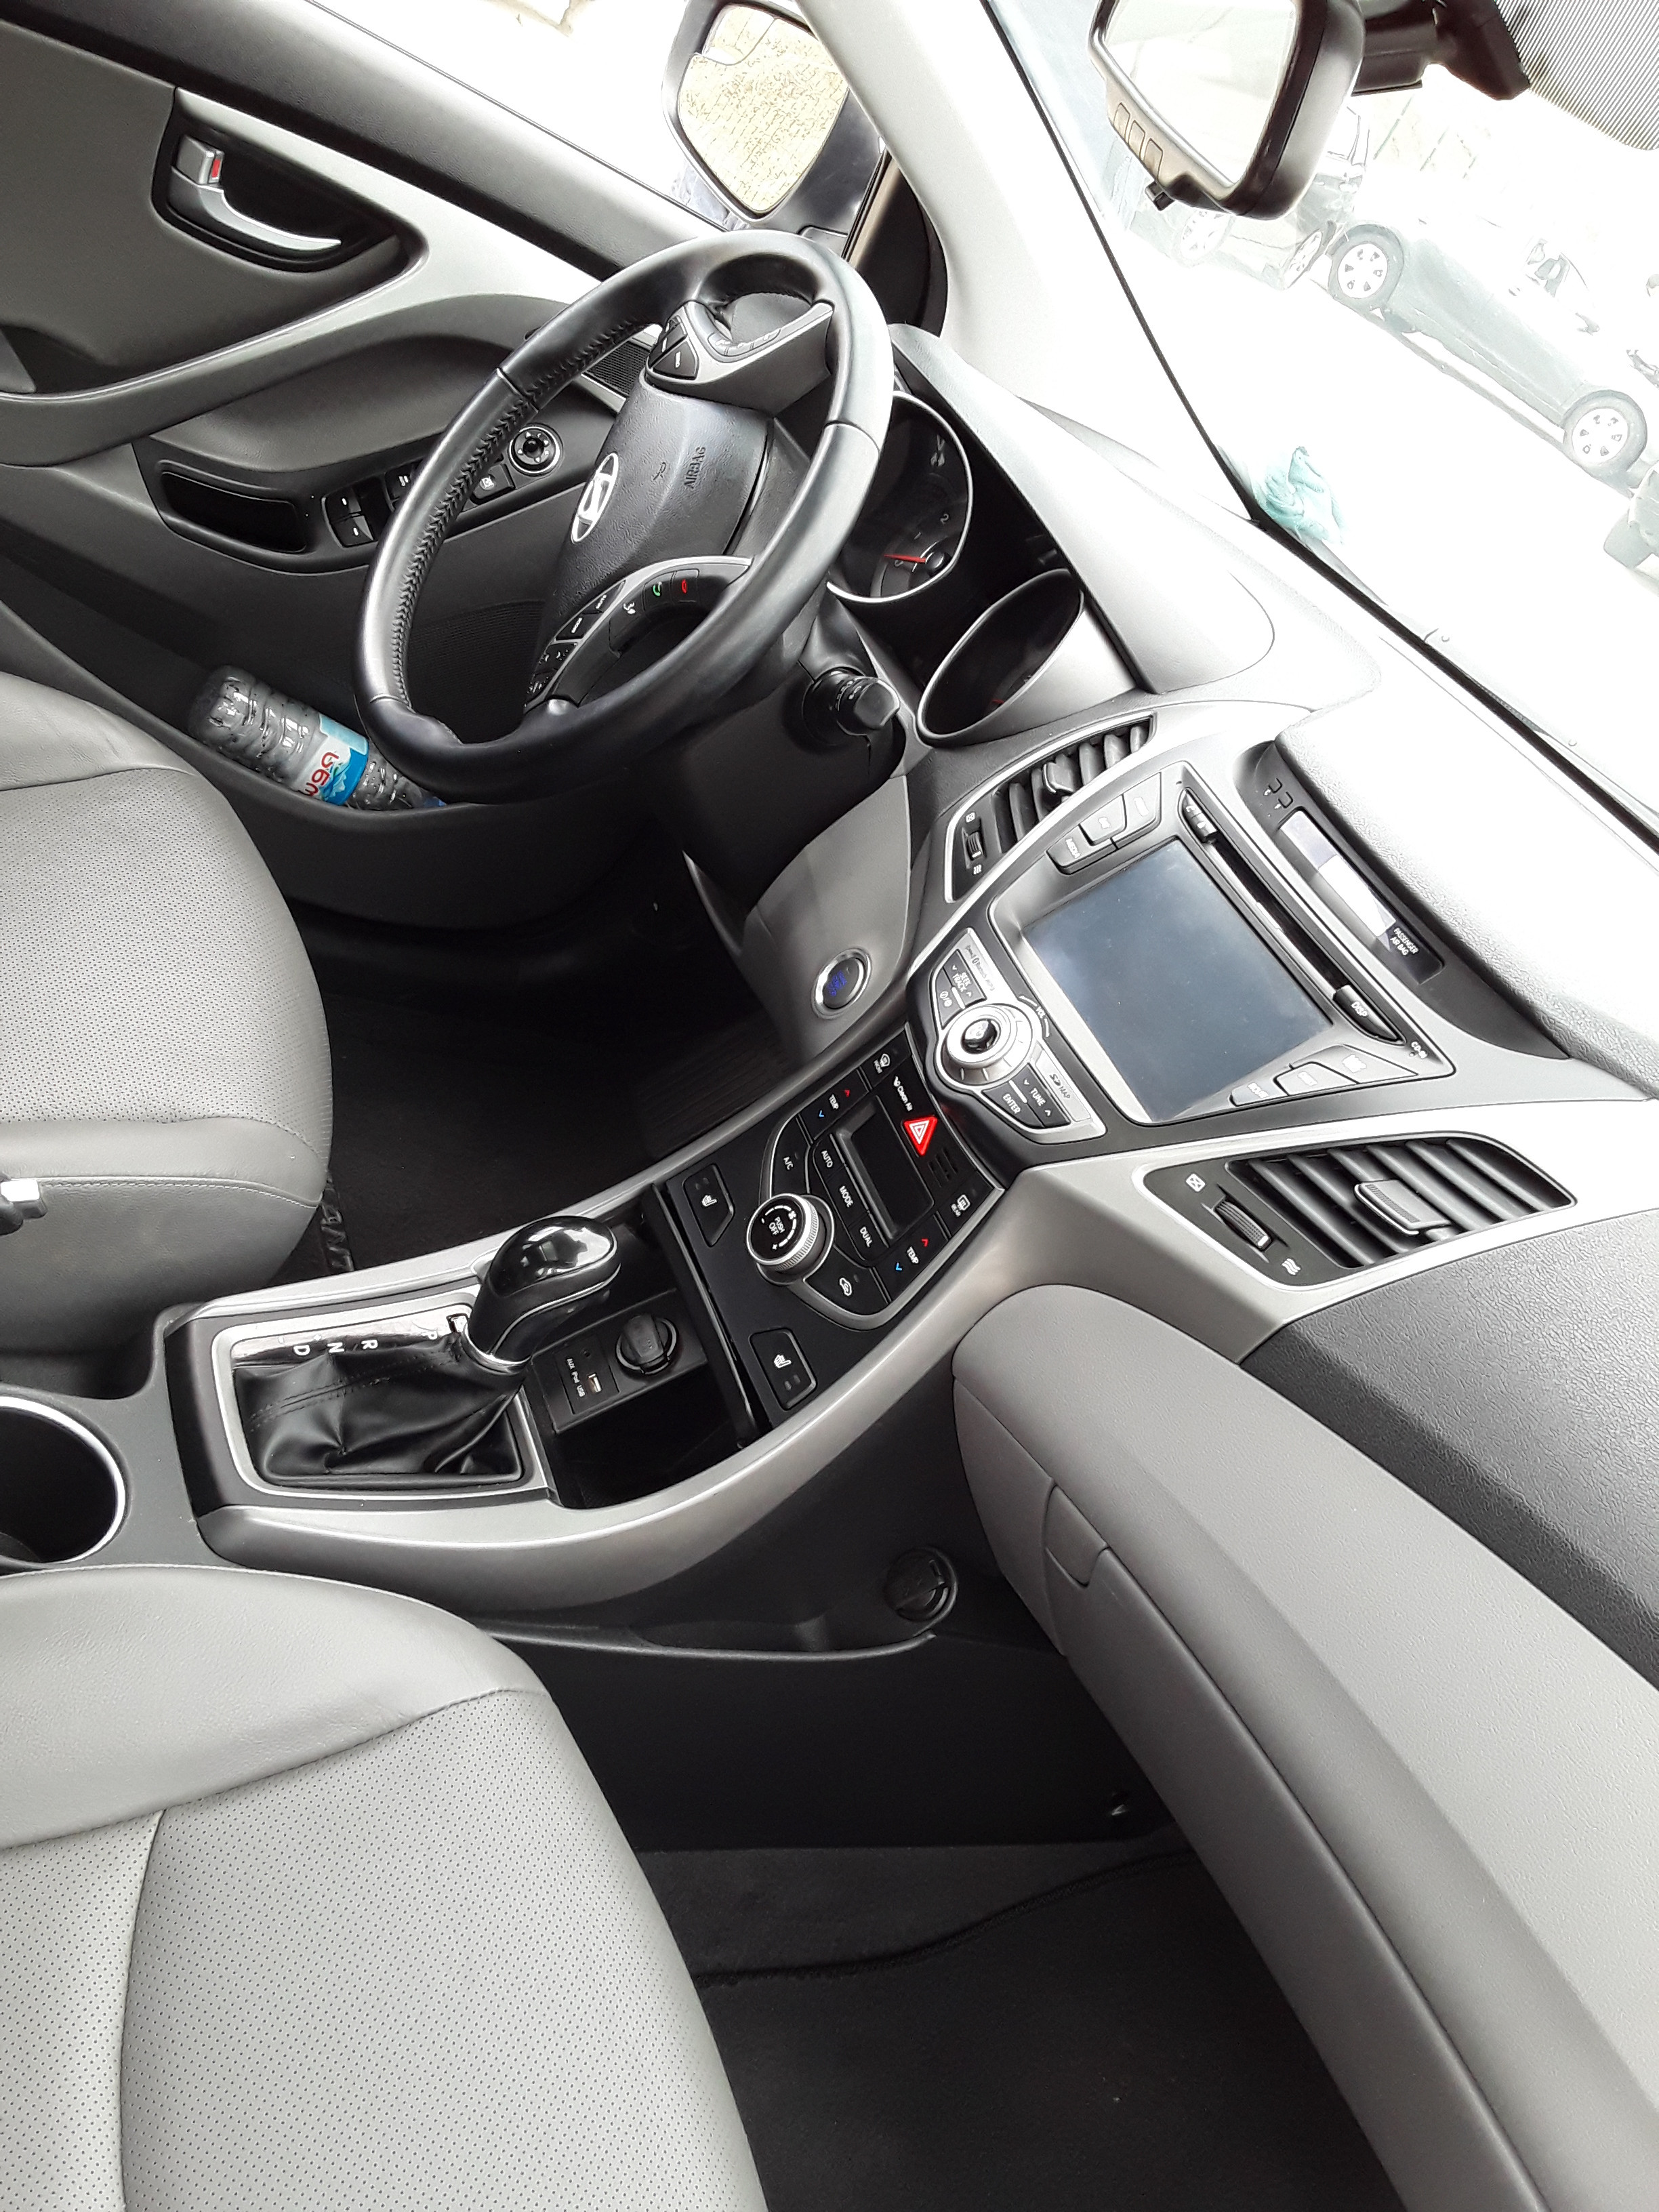 Hyundai Elantra 1.8(lt) 2015 İkinci əl  $7000